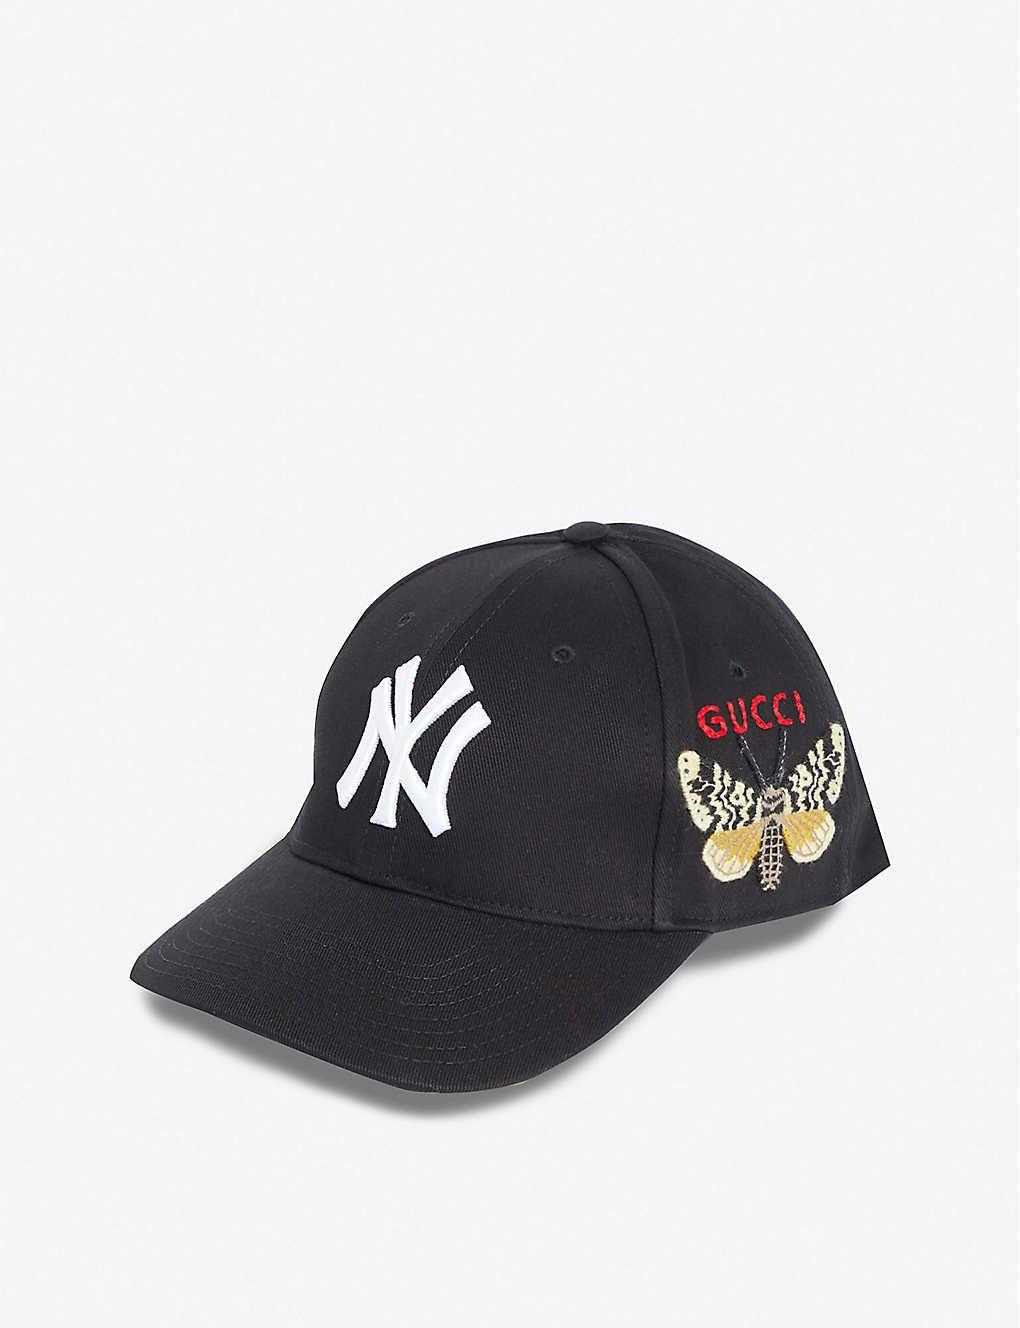 New York Yankees Patch Canvas Baseball Cap Gucci New York Gucci Gucci Hat